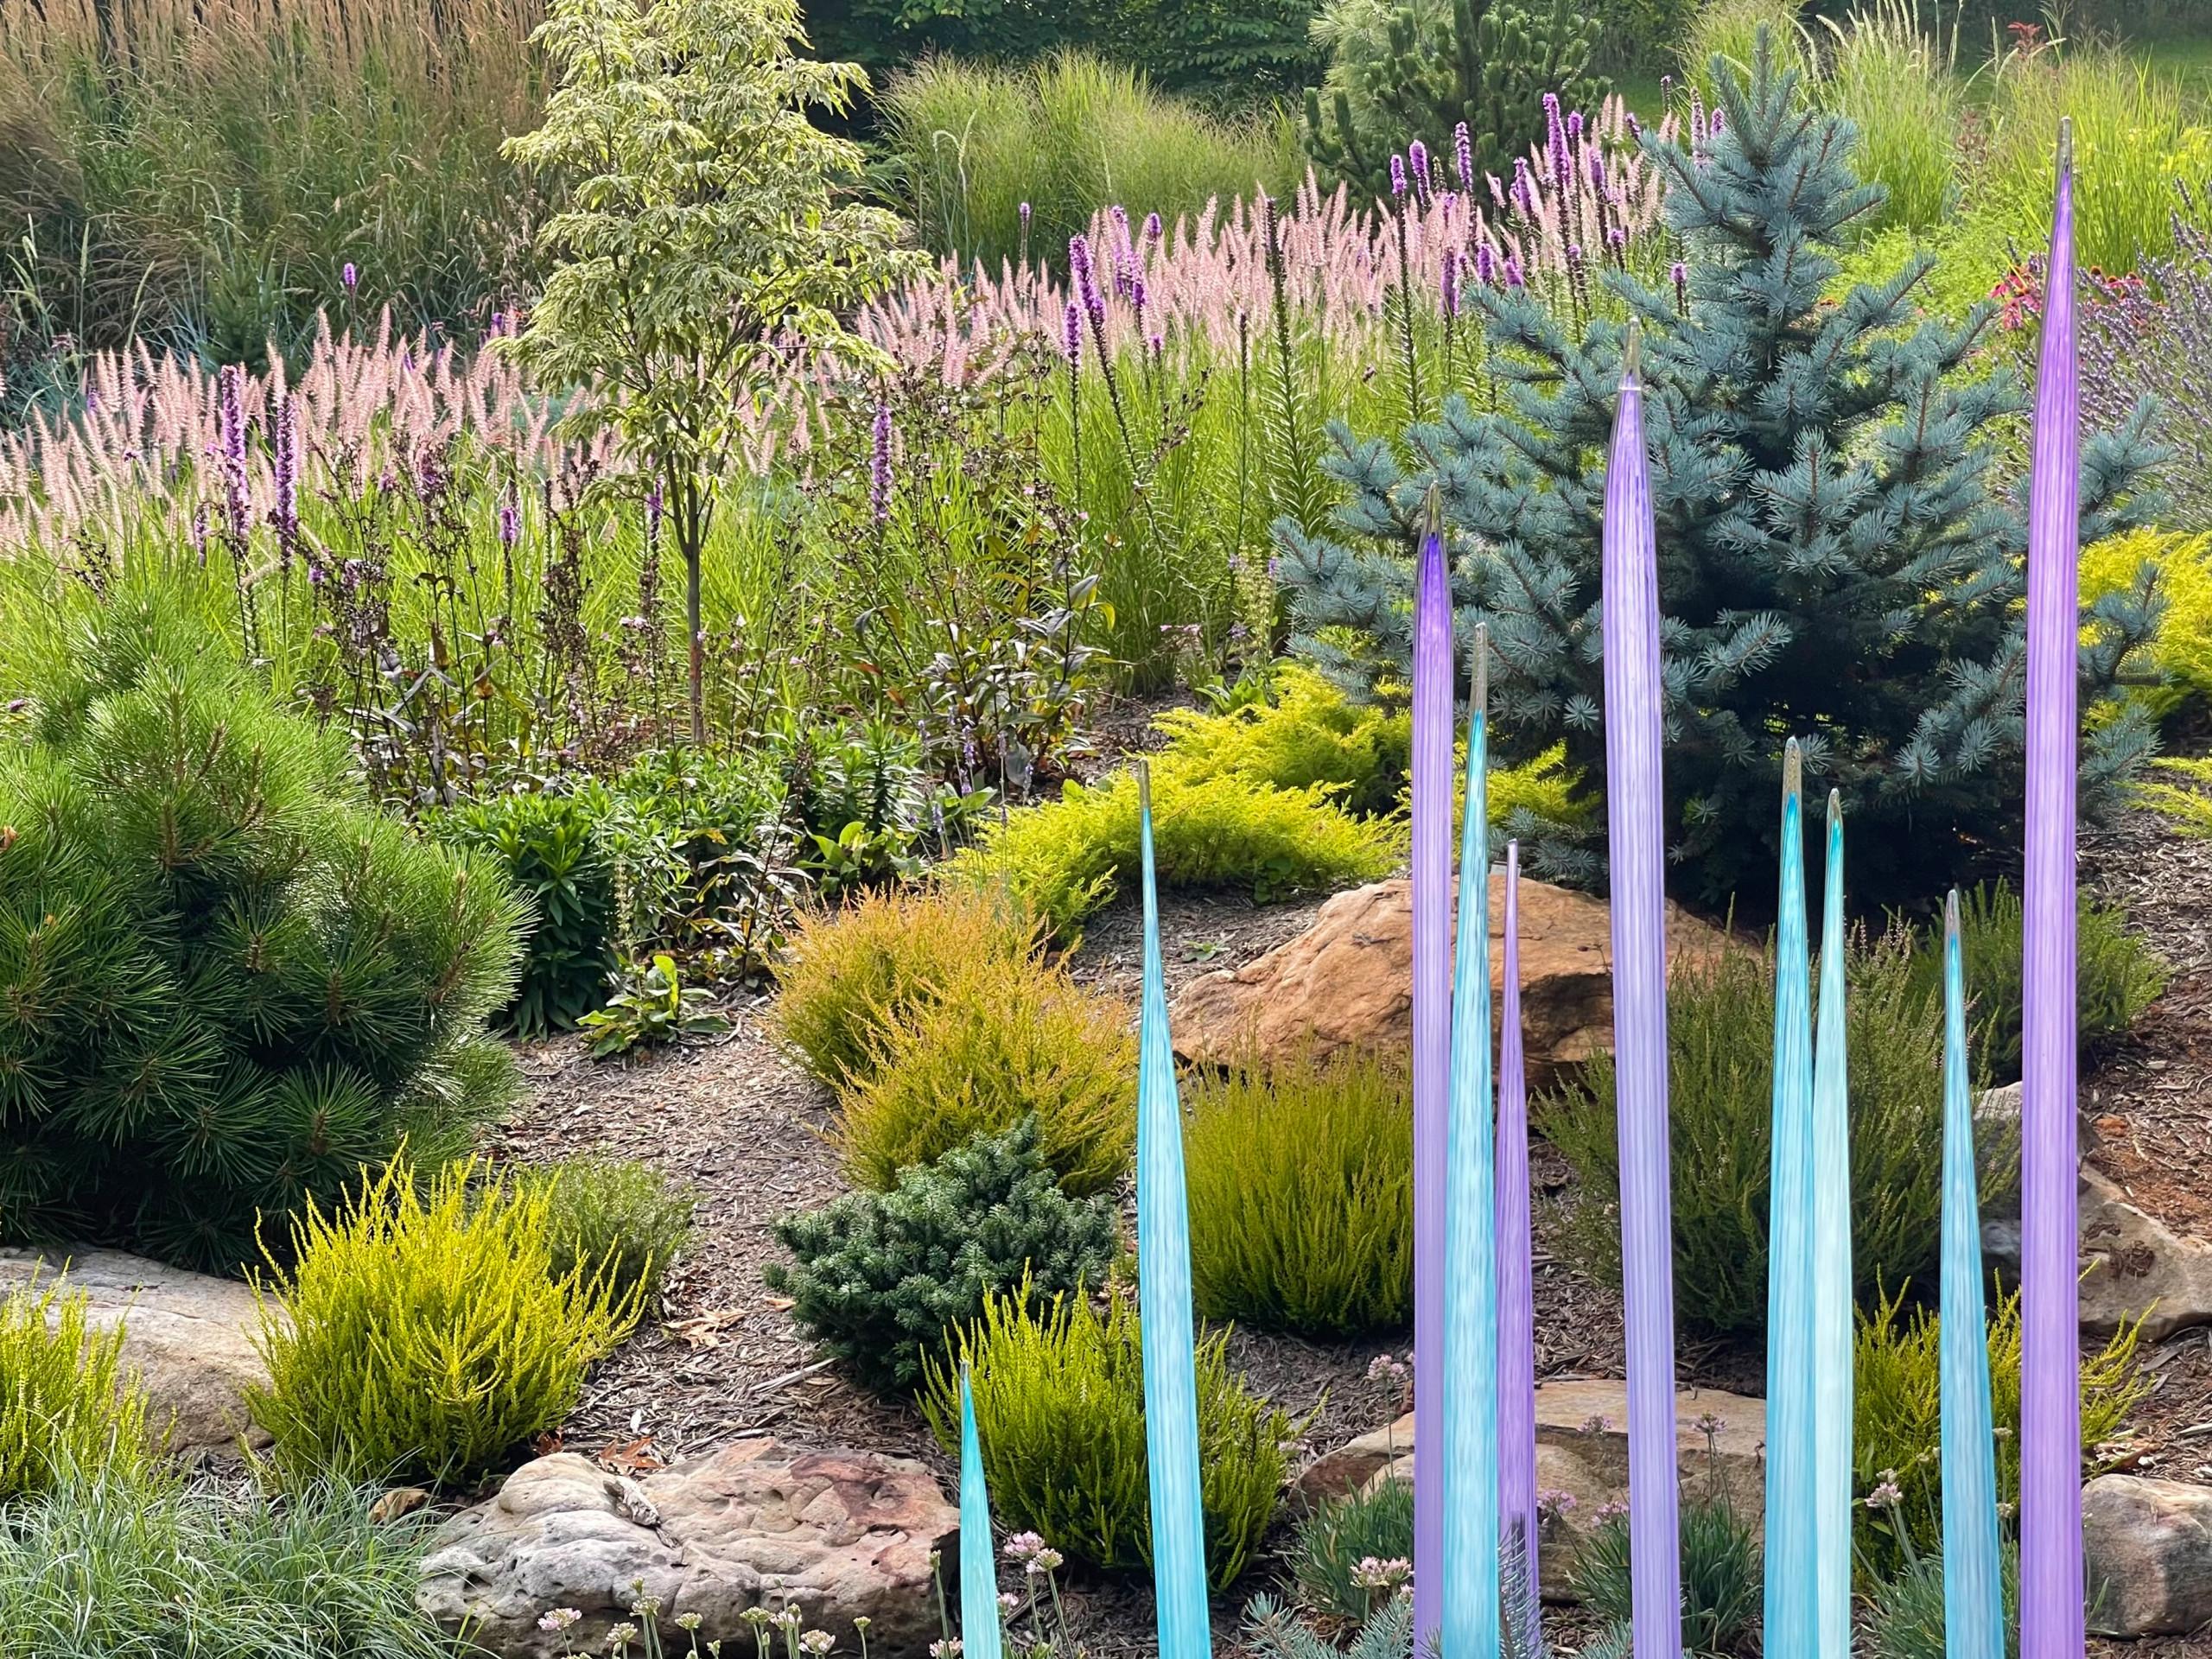 Glass spears, liatris and pennisetum